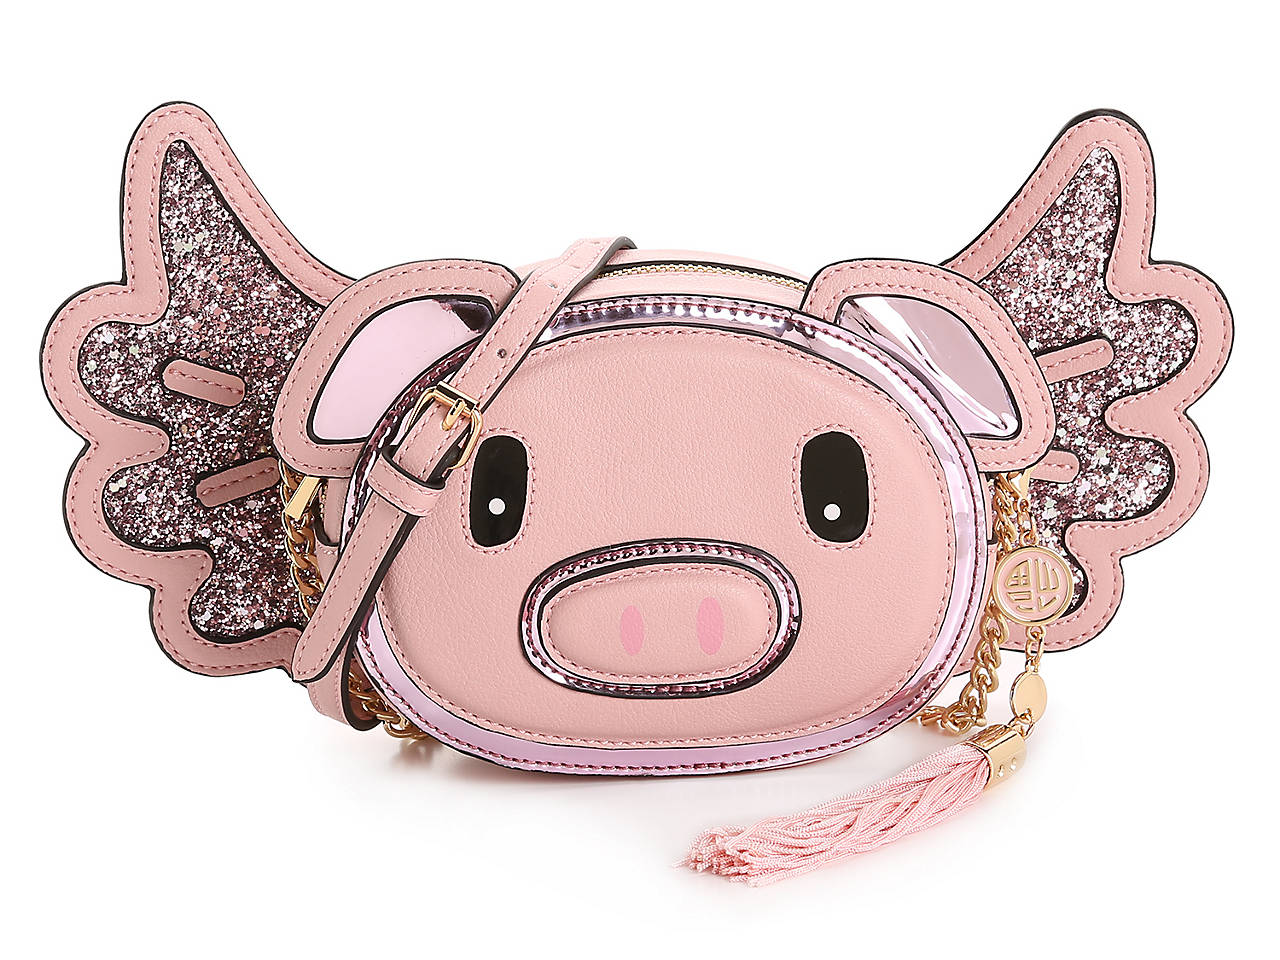 08b08cad0753a9 Aldo Baffa Pig Crossbody Bag Women's Handbags & Accessories   DSW